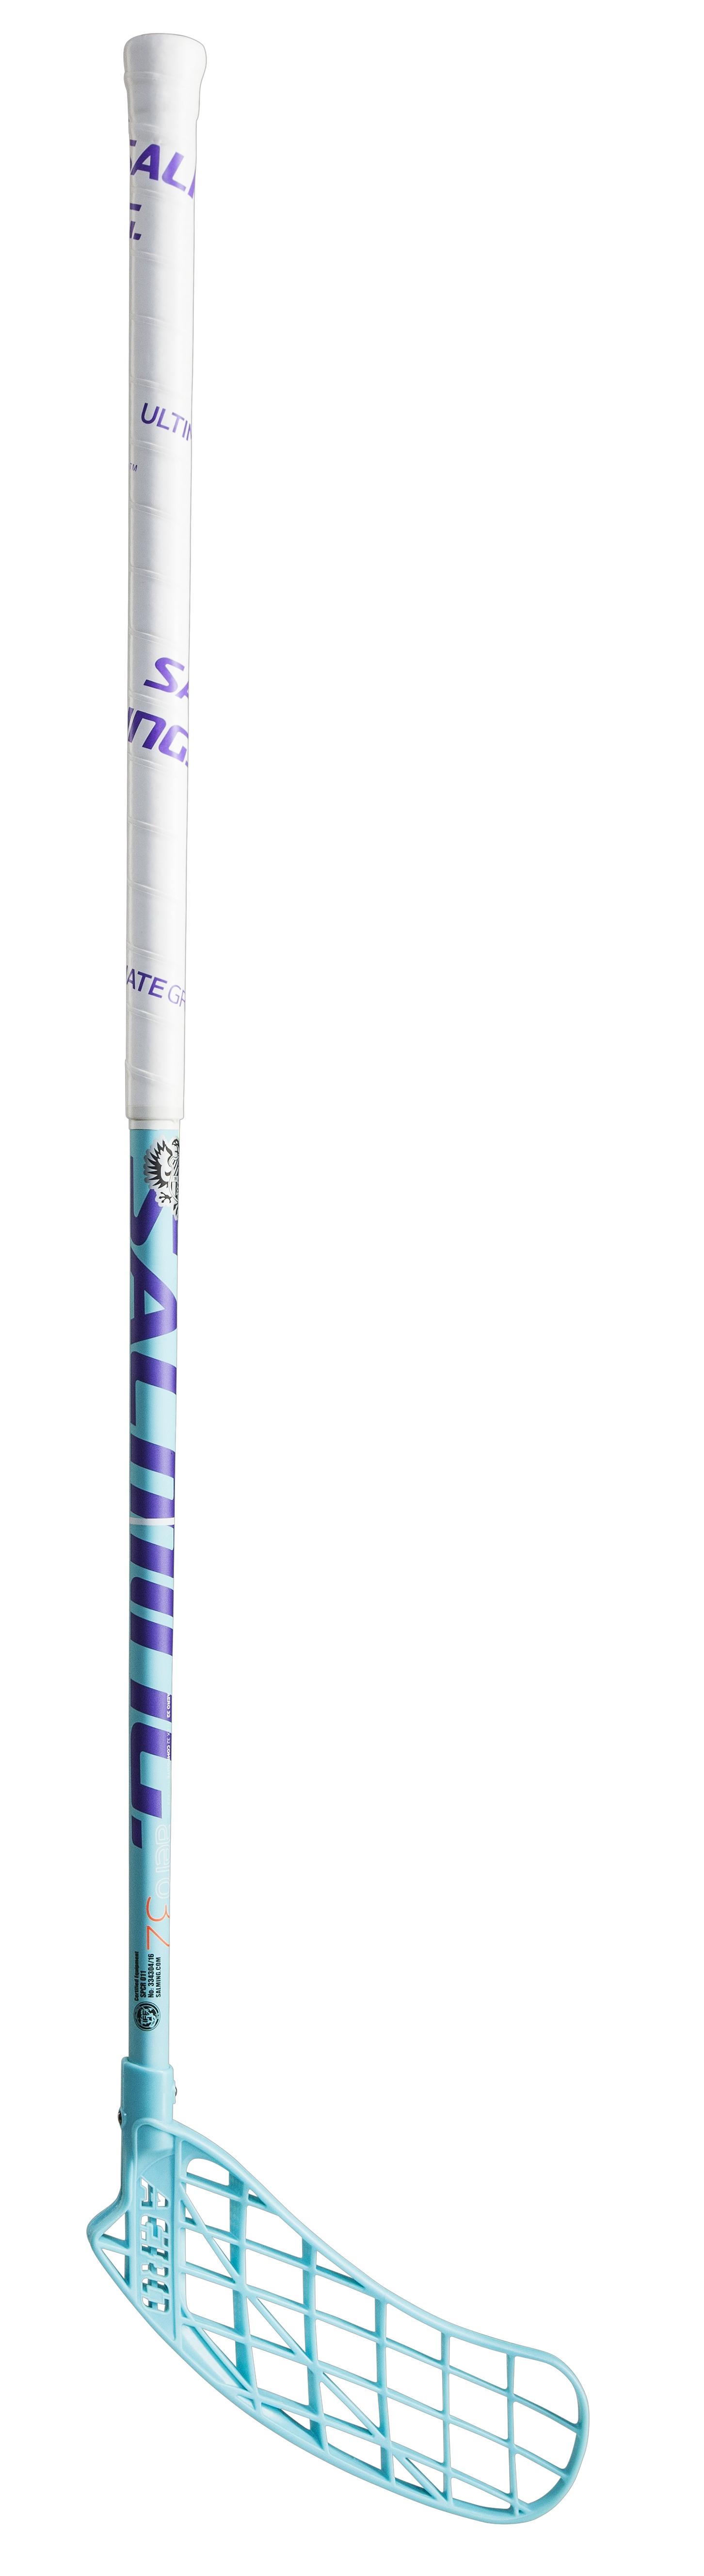 Image of   Salming Composite 32 Stick Senior Right